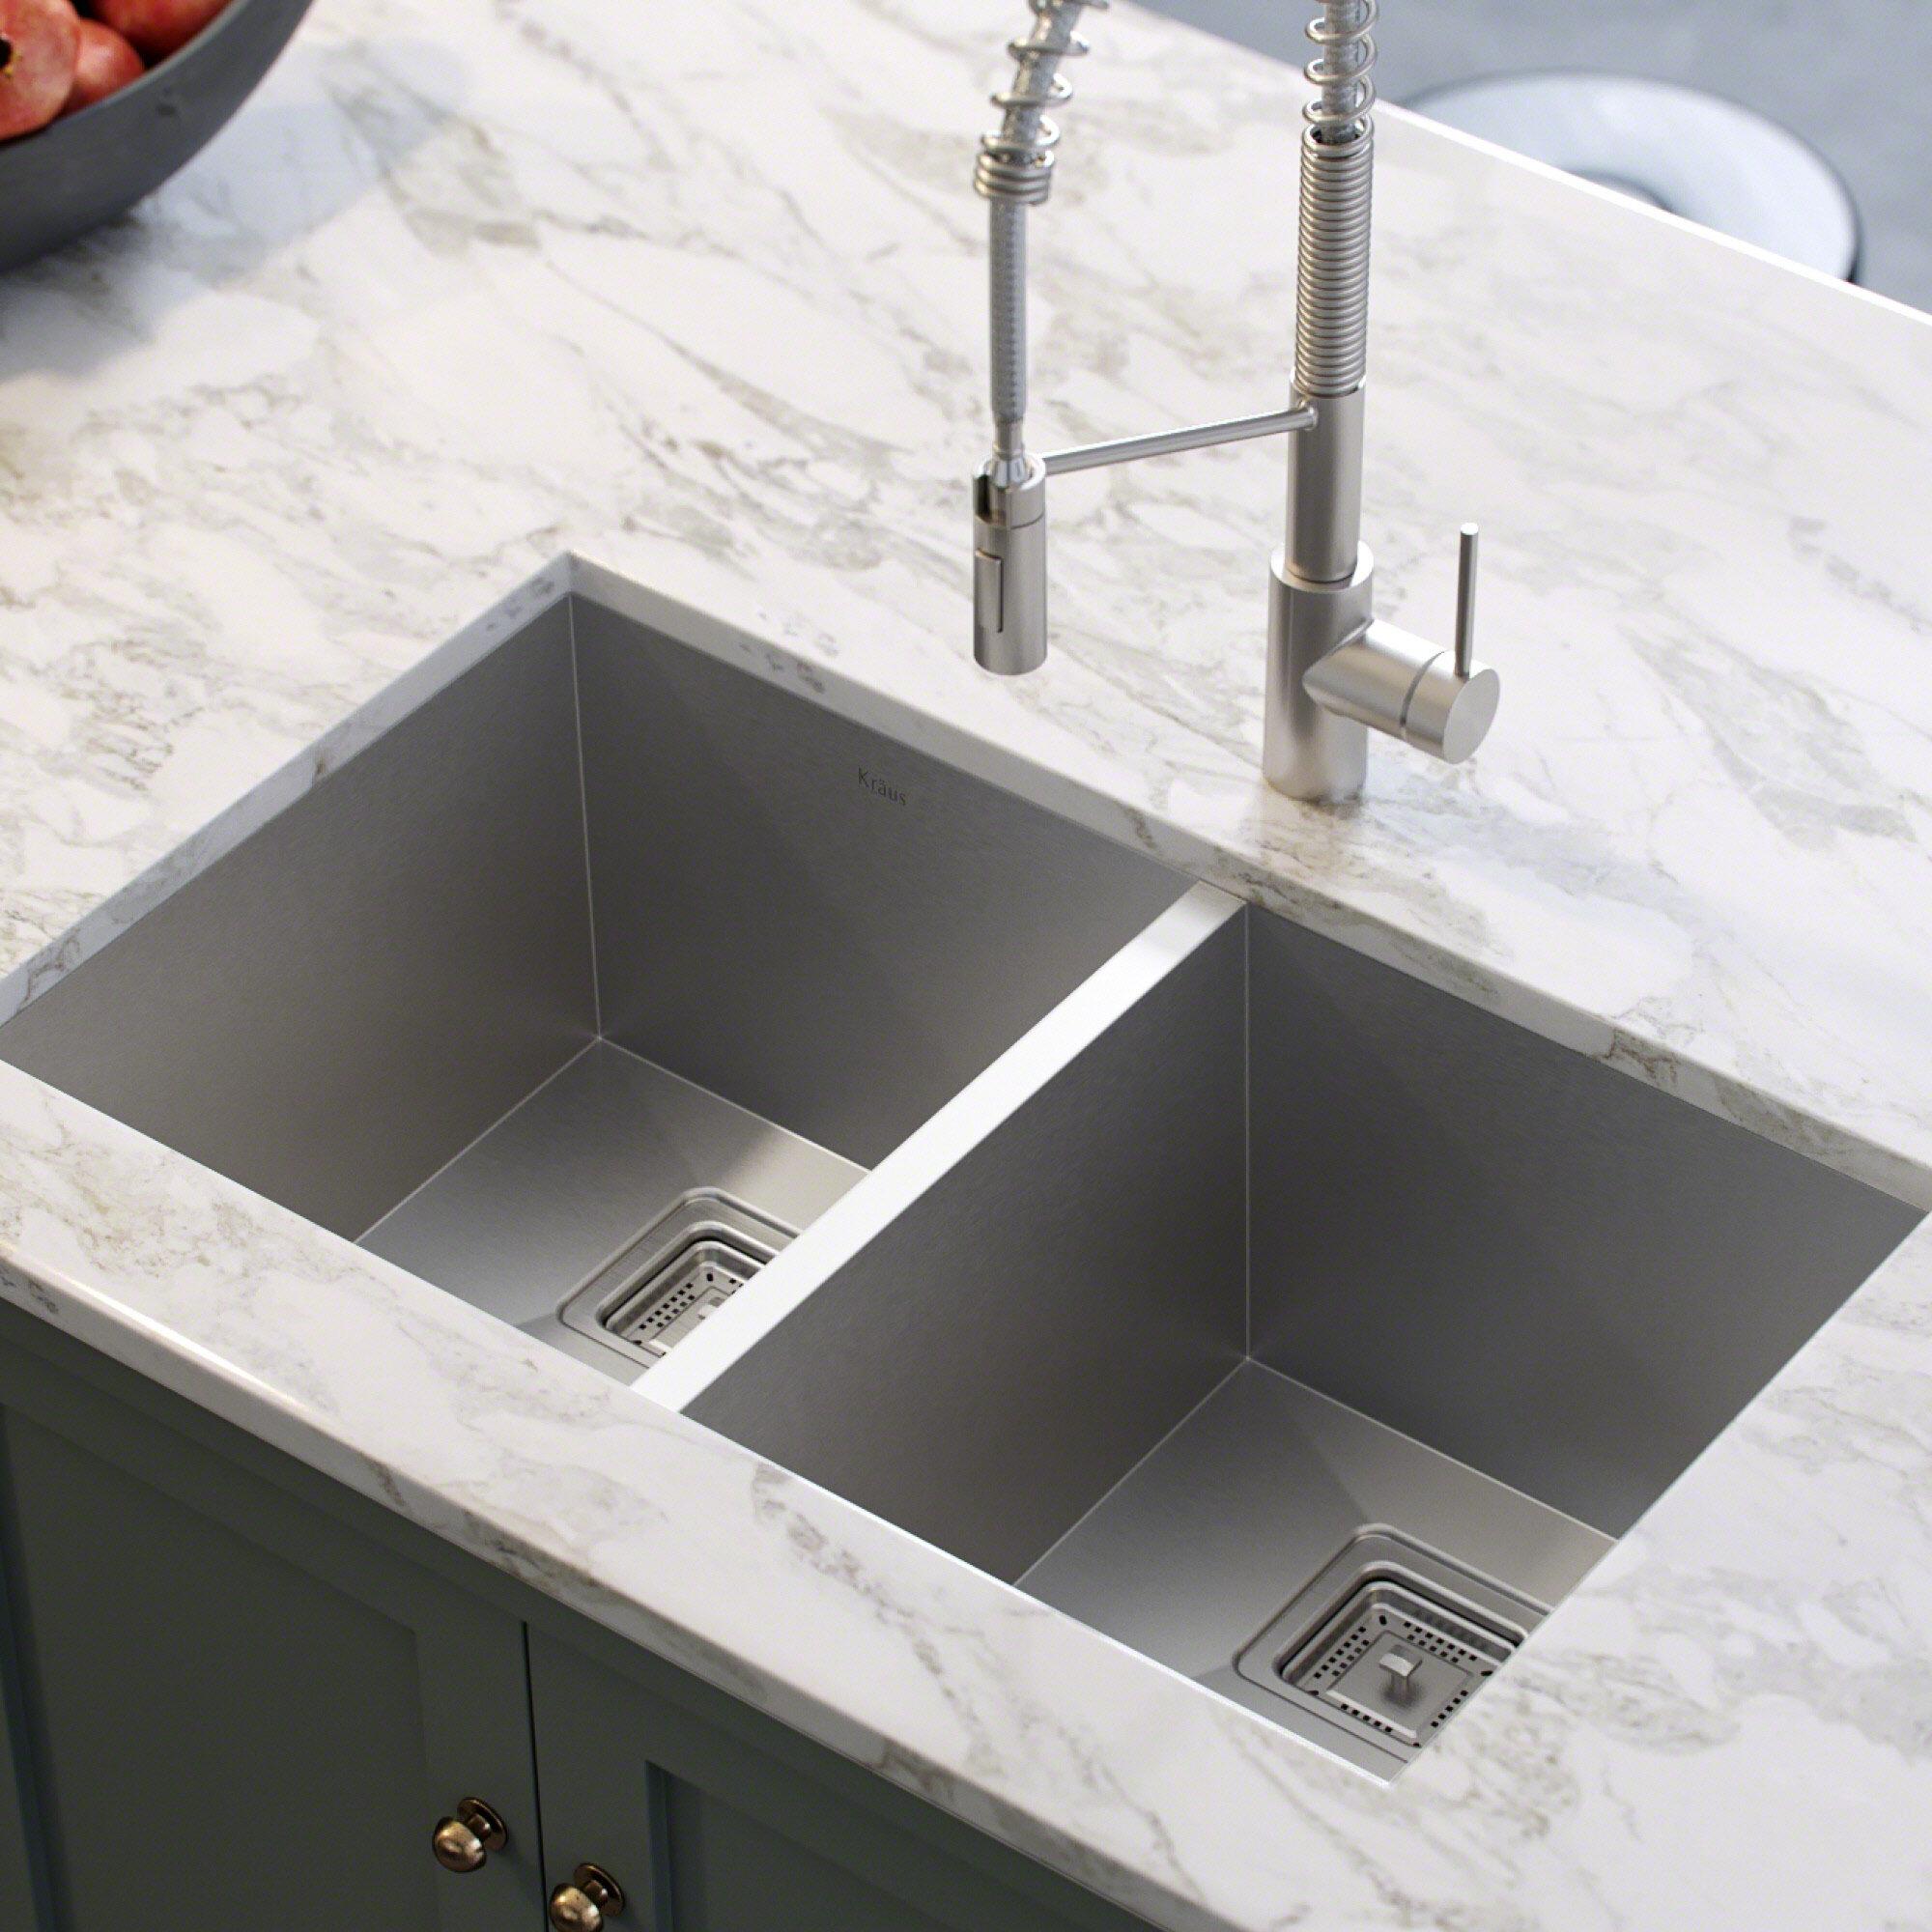 [Hot Item] Double Bowl Indian Kitchen Design Sink